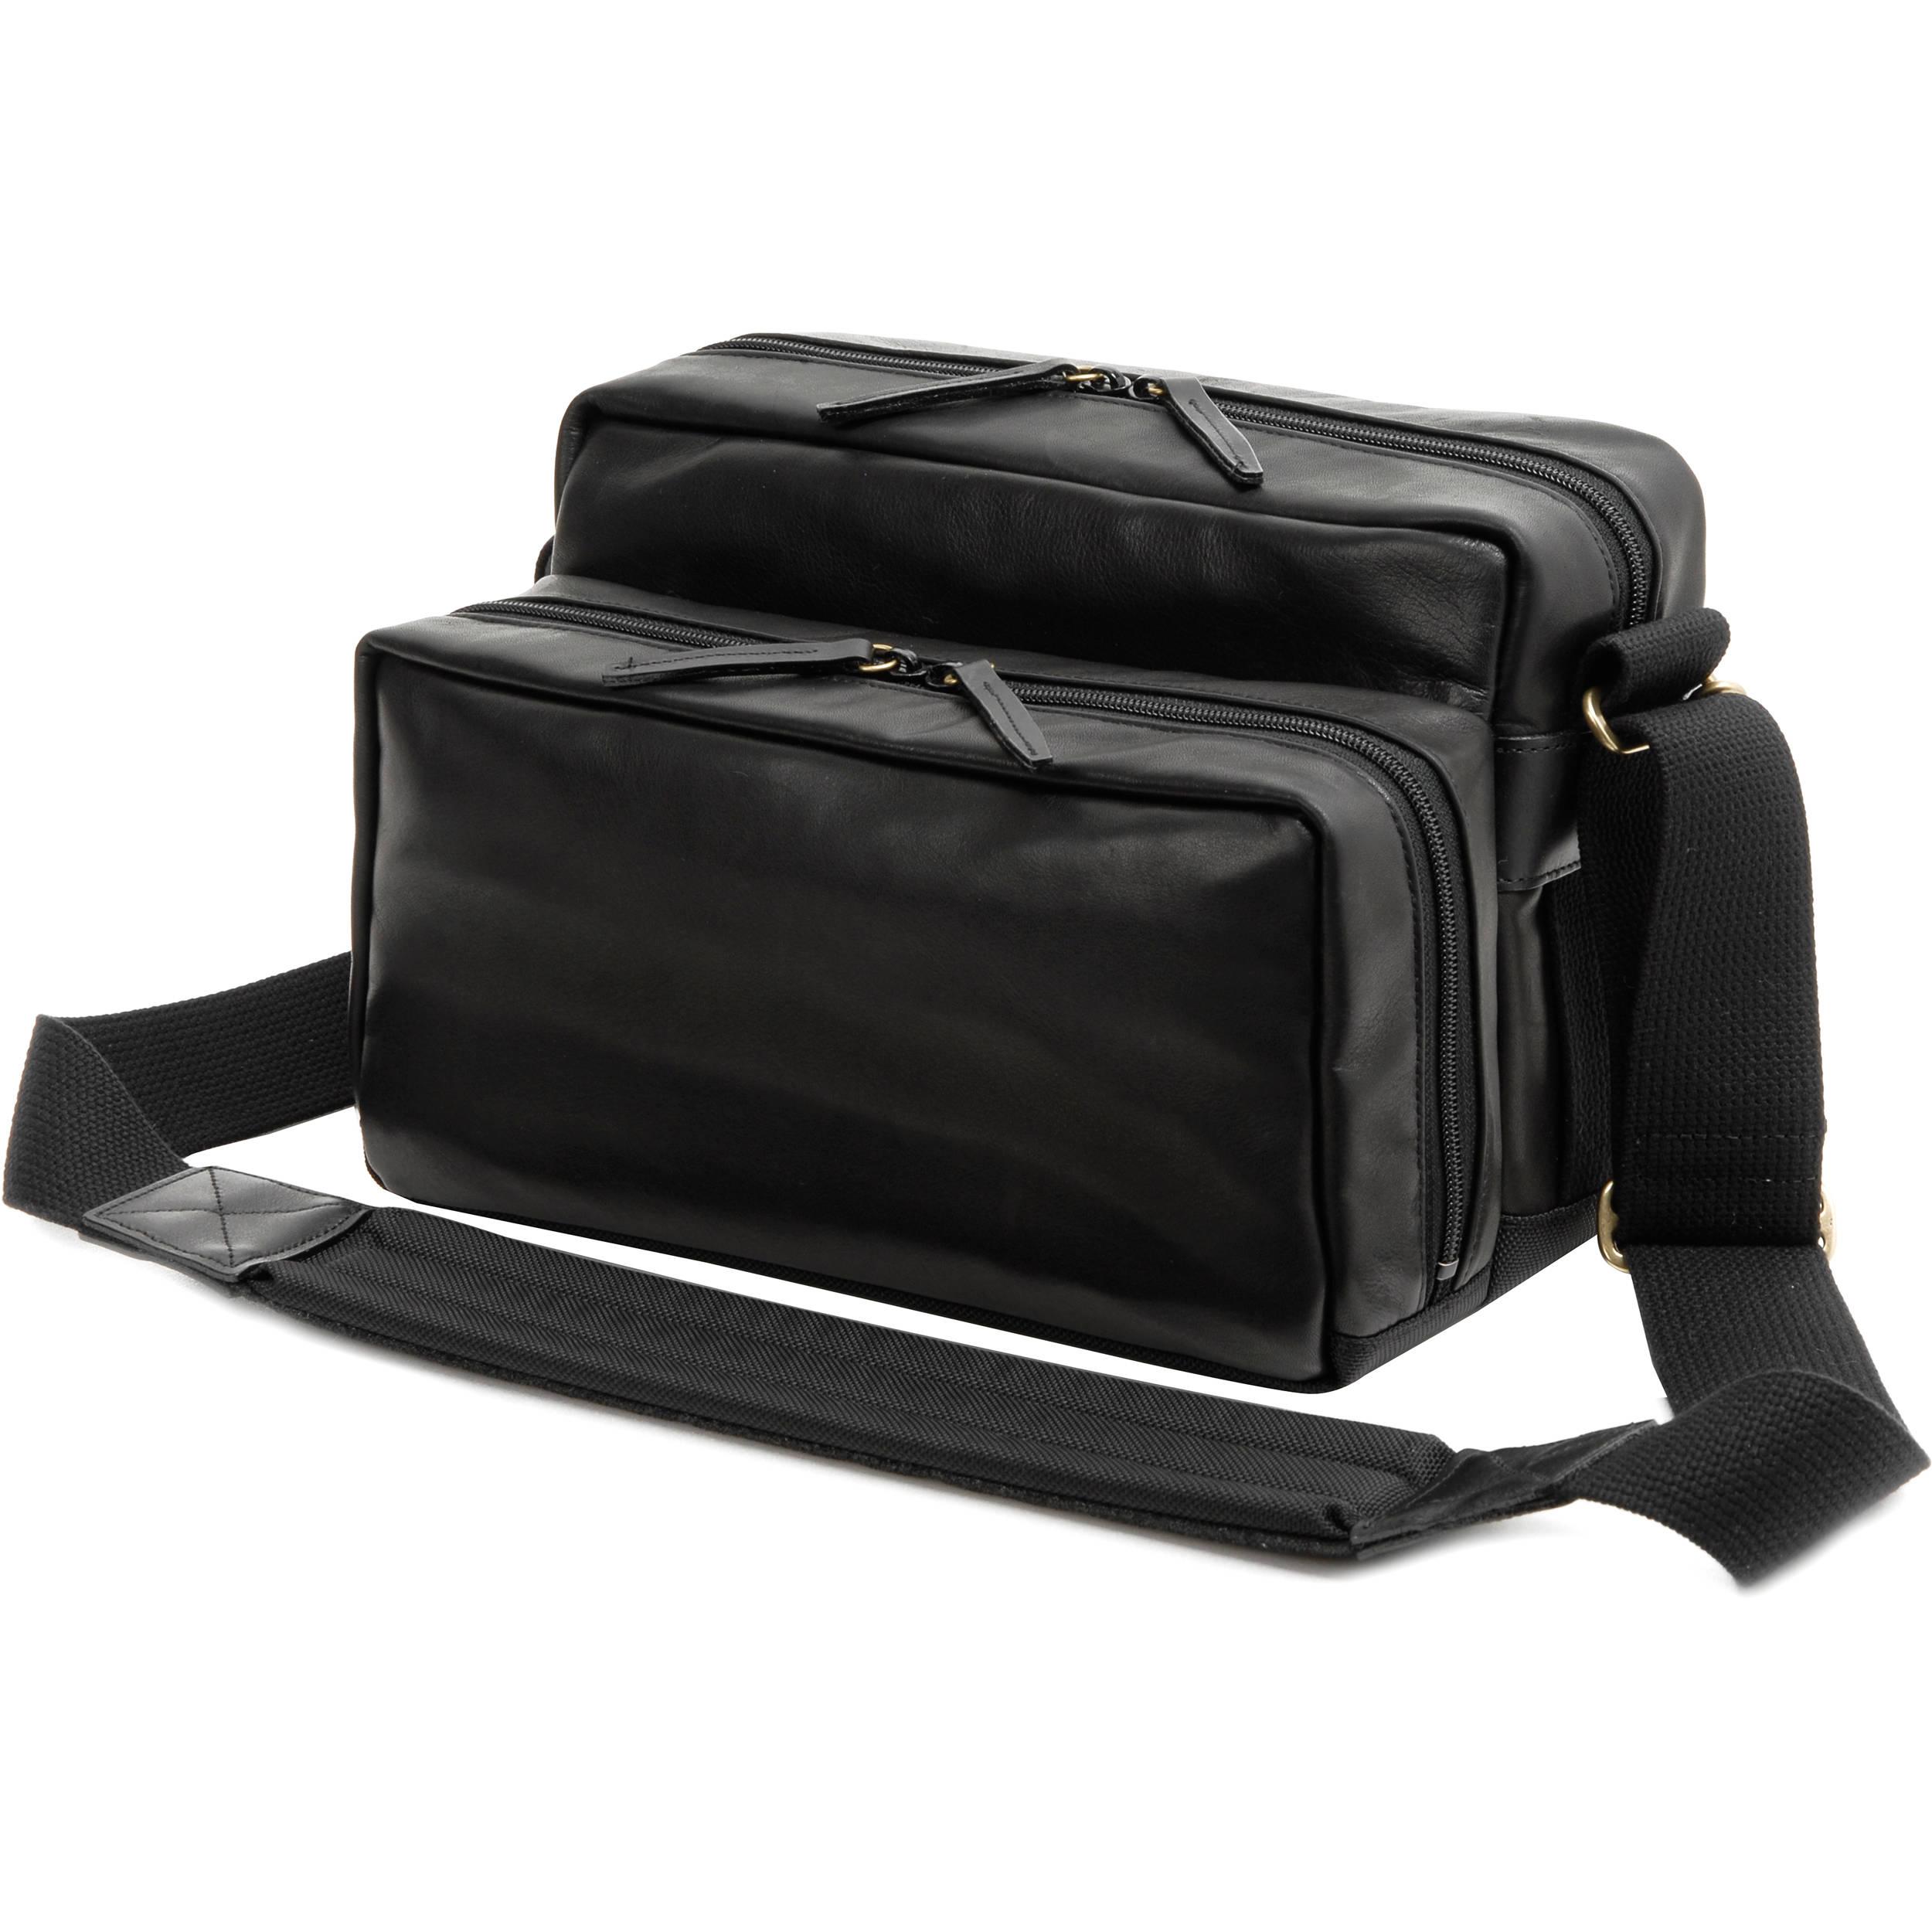 Artisan Artist Lee S Luxury Camera Bag Aagcam1000blk B H Photo